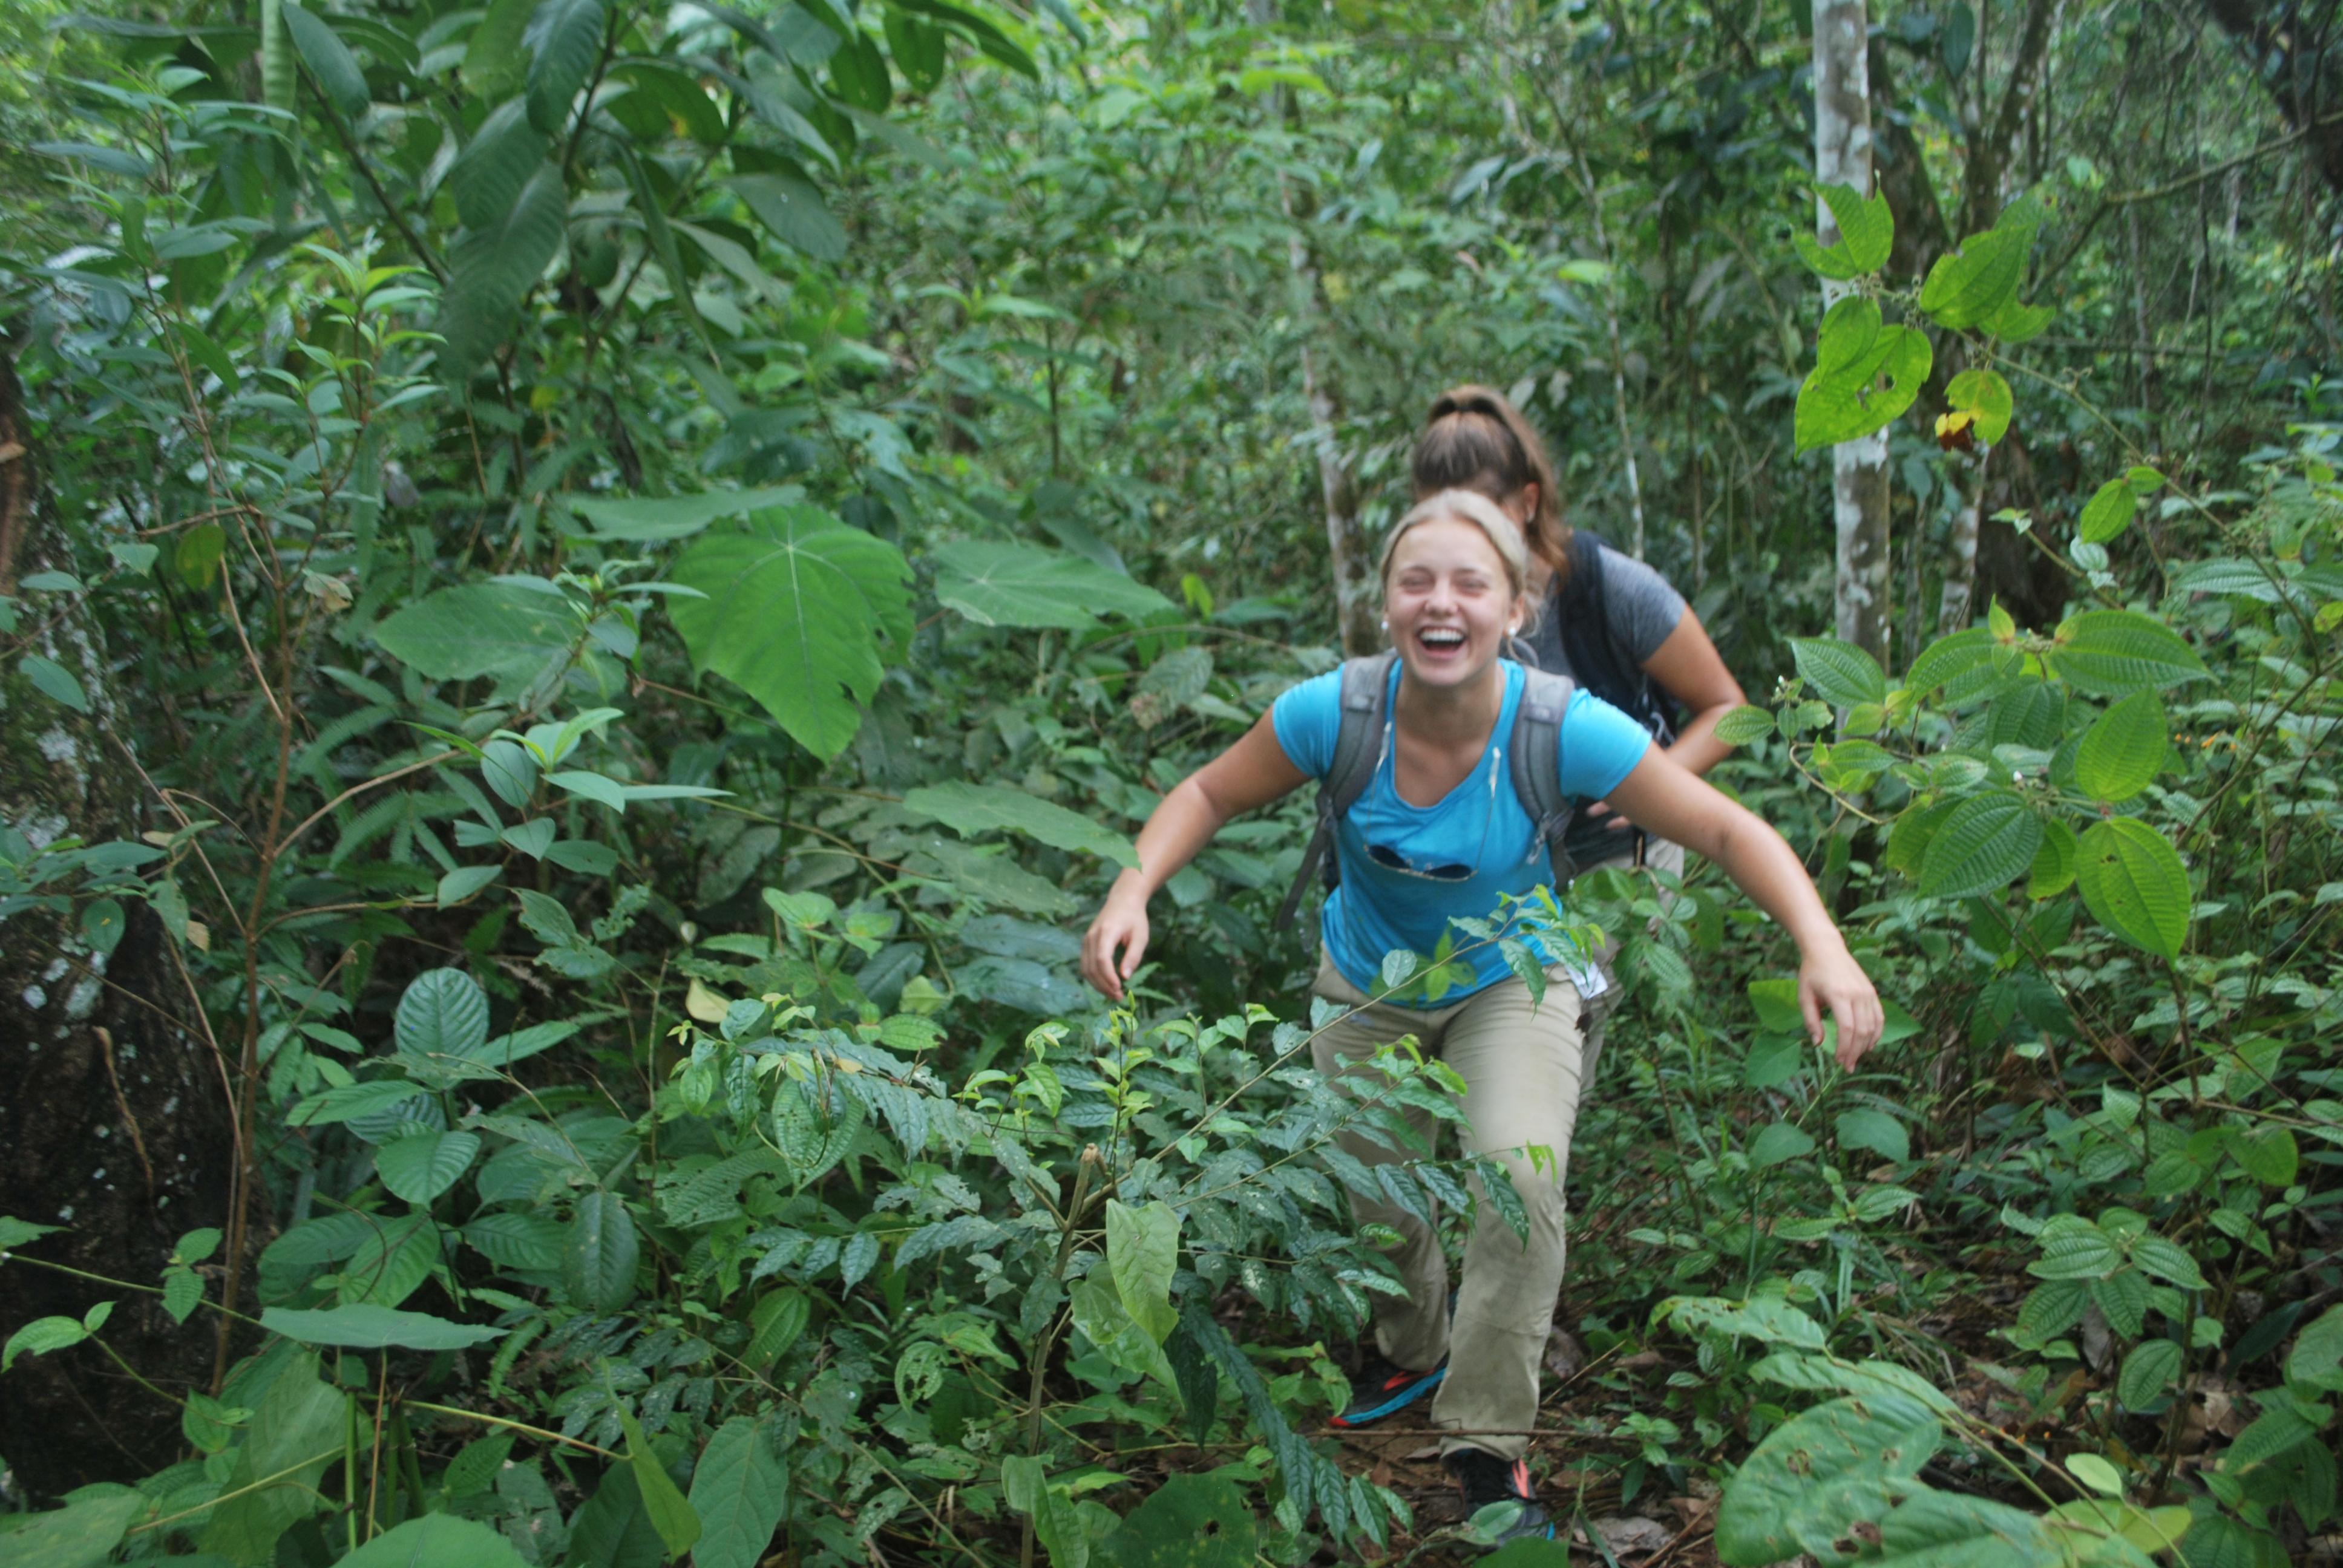 Gap Year Program - ARCC Gap | Pacific Islands: Fiji, Sumatra & Bali  5